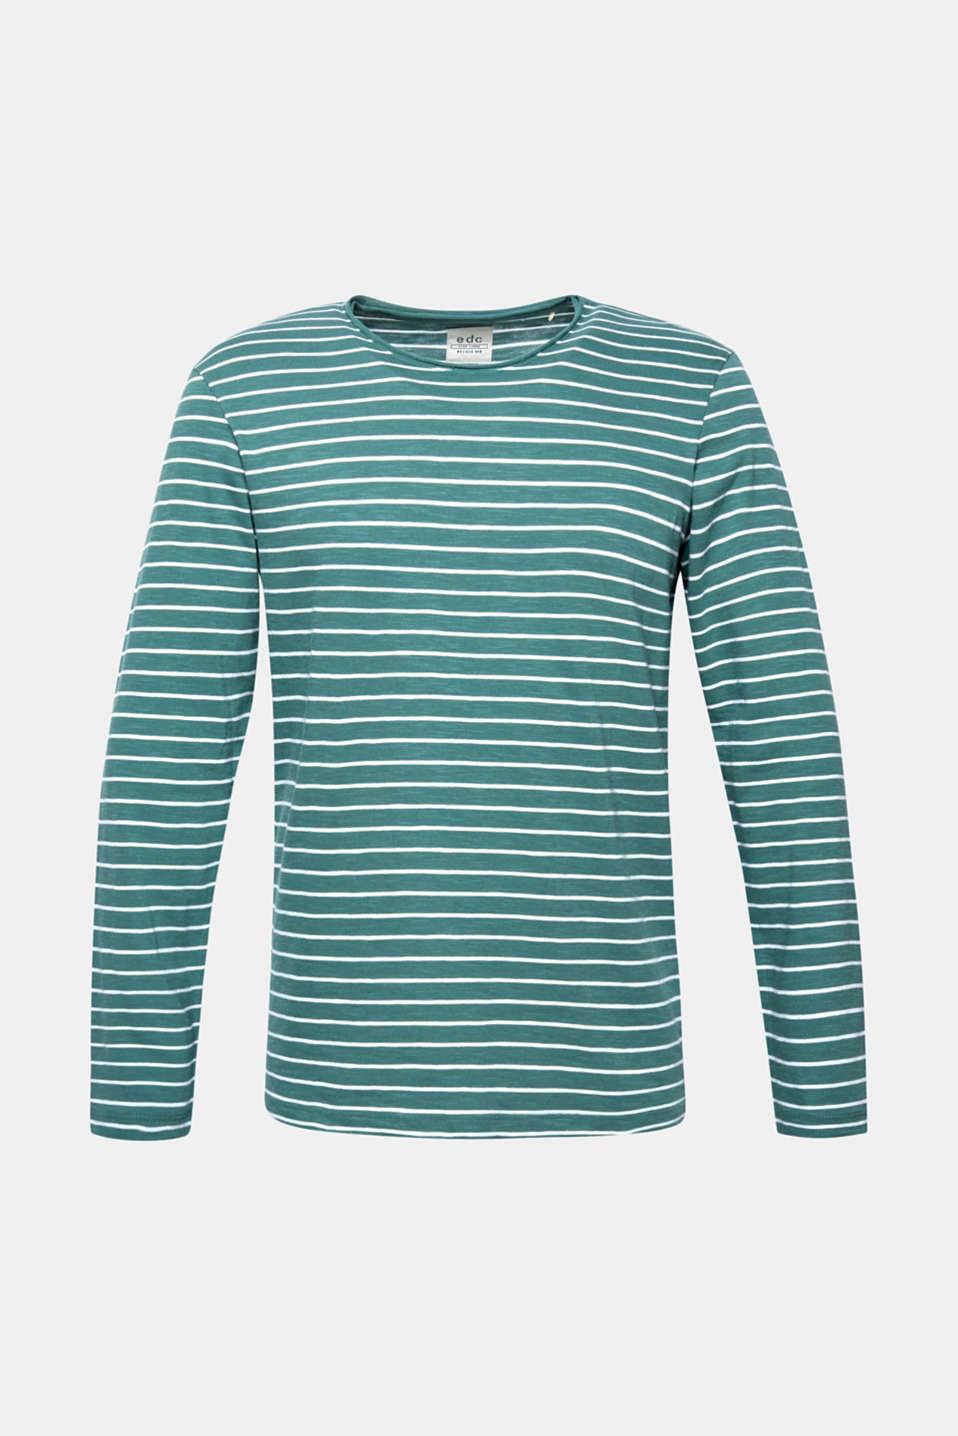 Jersey longsleeve top made of slub jersey, DUSTY GREEN, detail image number 5